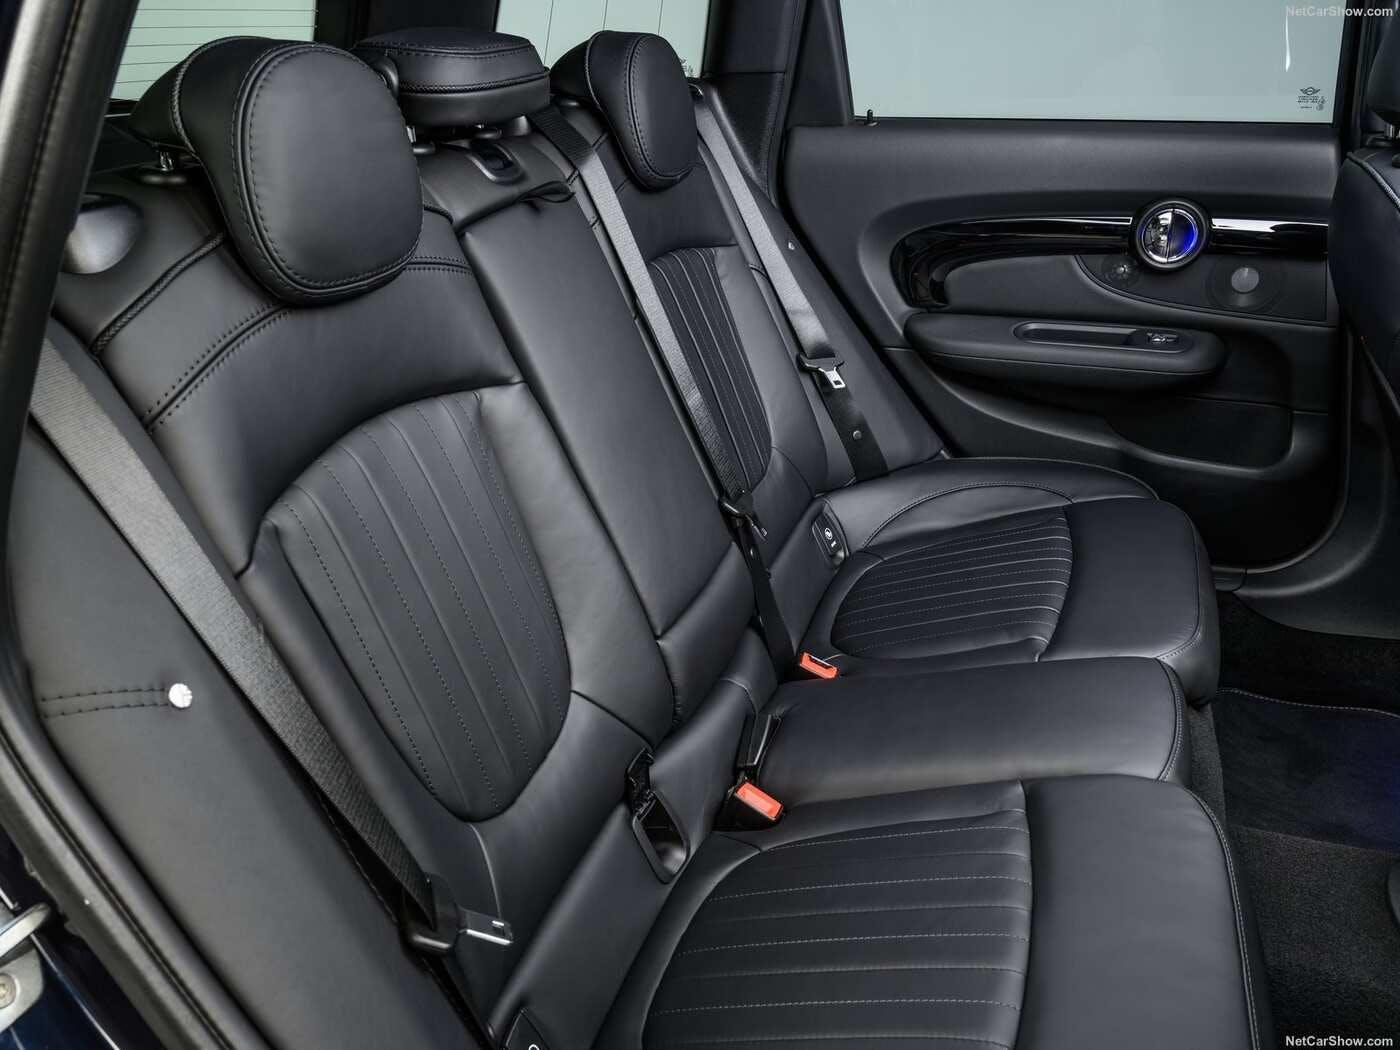 RENAULT CLIO WILLIAMS METAL KEY RING CHOOSE YOUR CAR COLOUR.